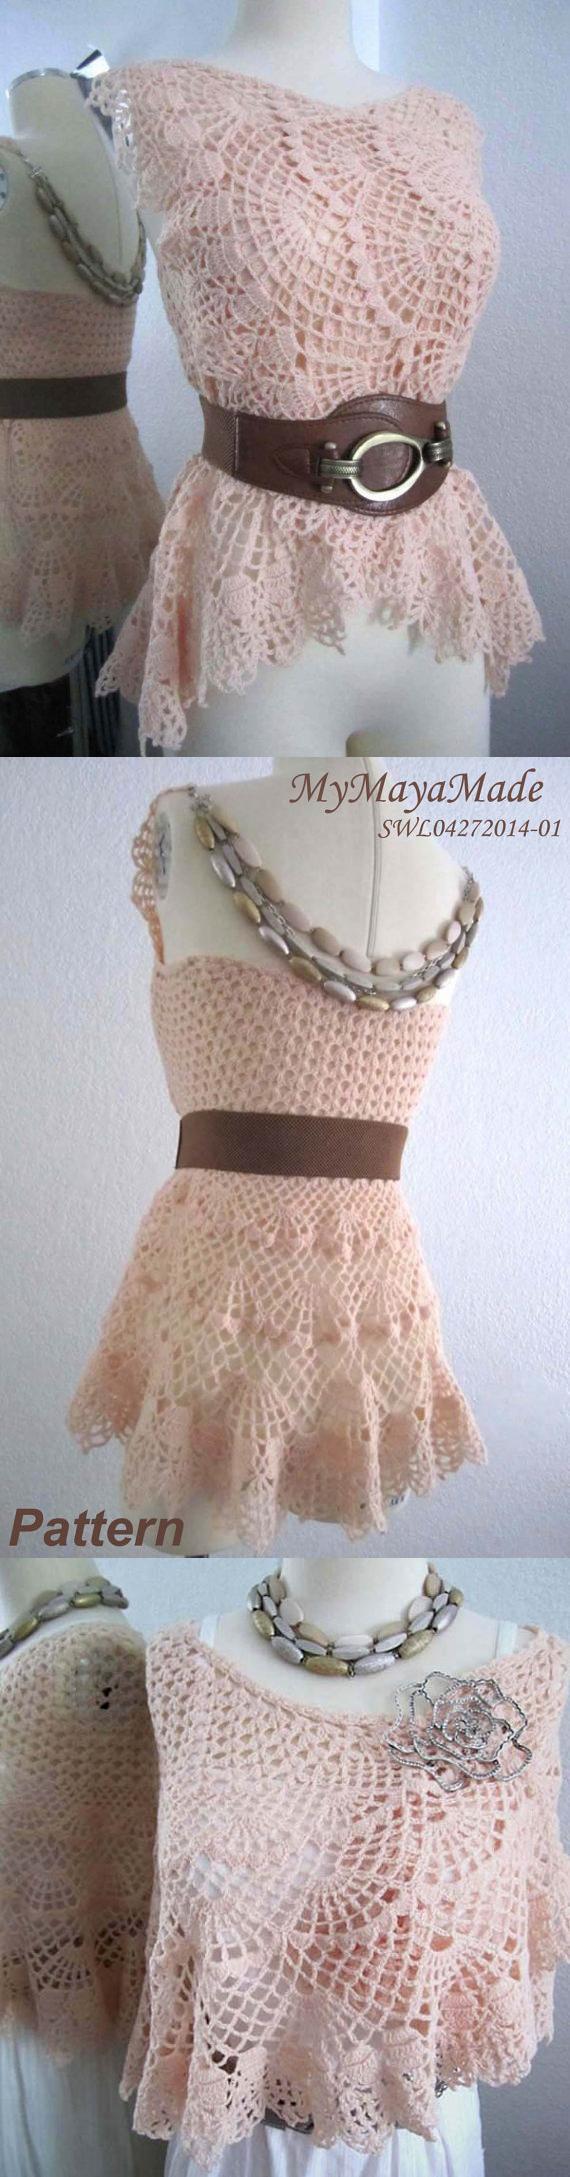 Crochet Pattern - Lithe and Pierced Crochet Dress, Shawl or Skirt ...